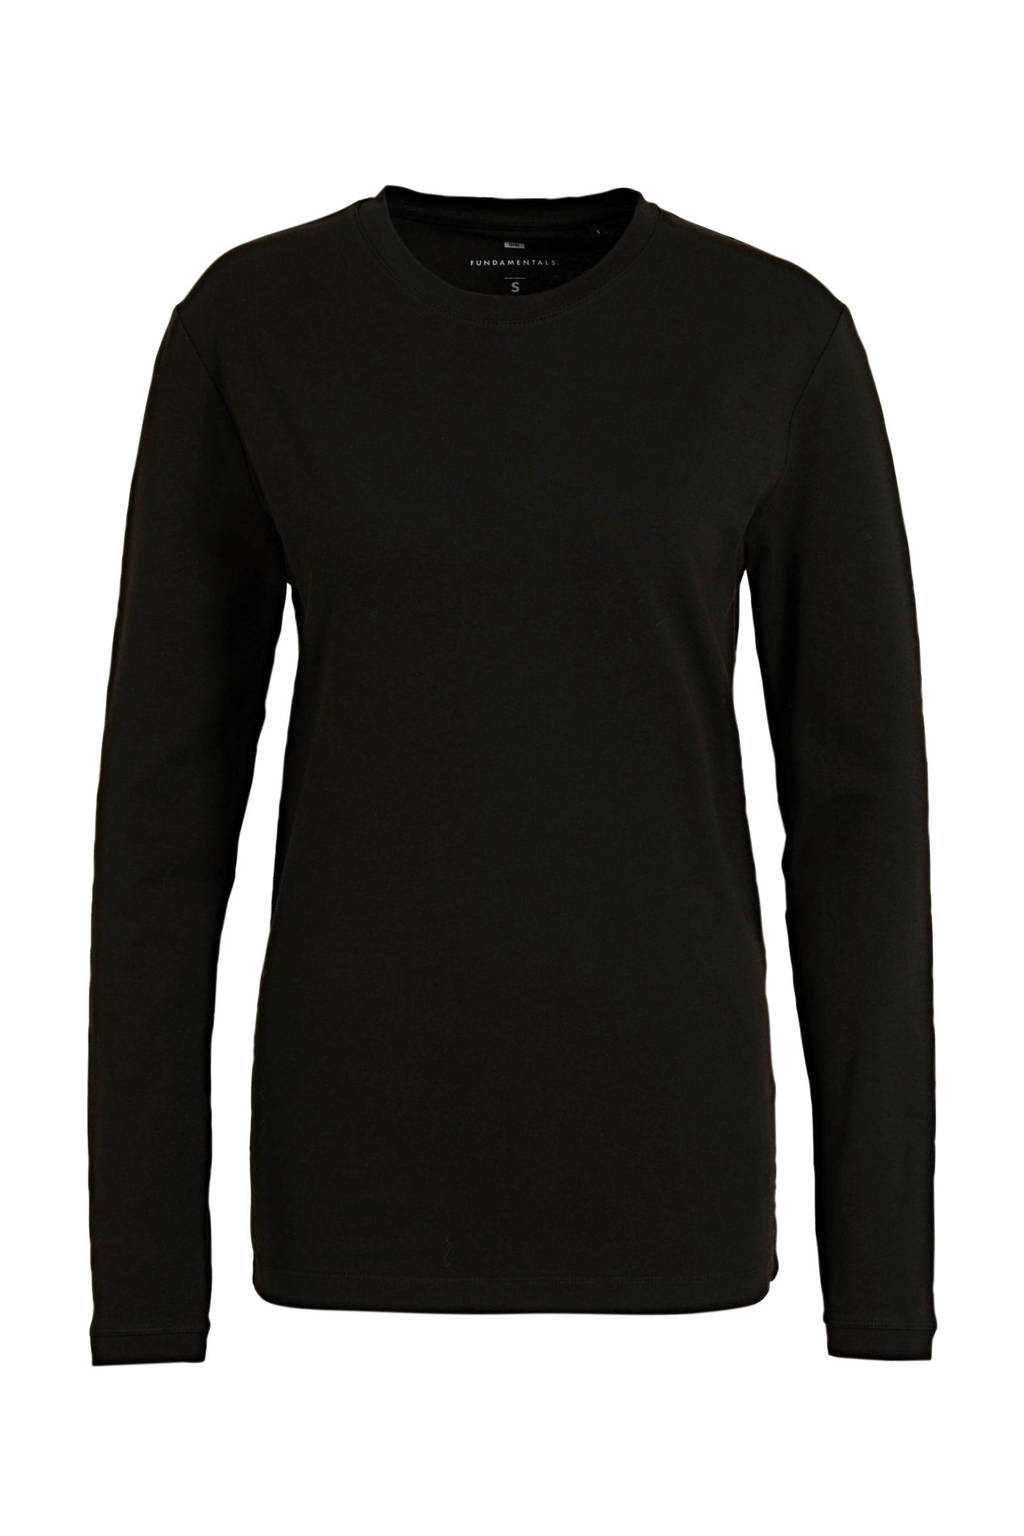 WE Fashion longsleeve zwart, Zwart